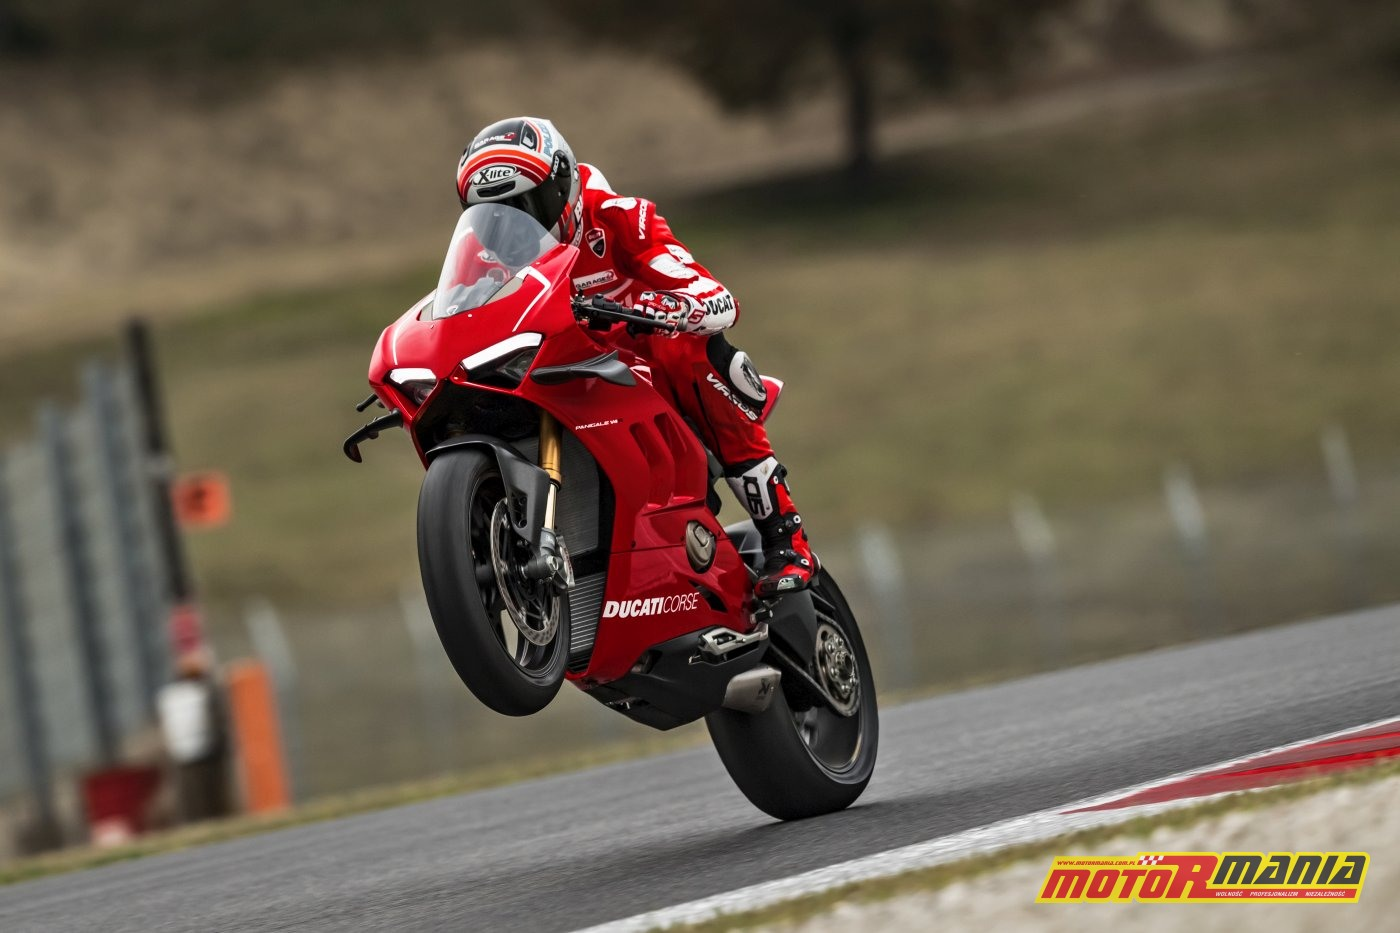 Ducati Panigale V4 R 2019 (45)